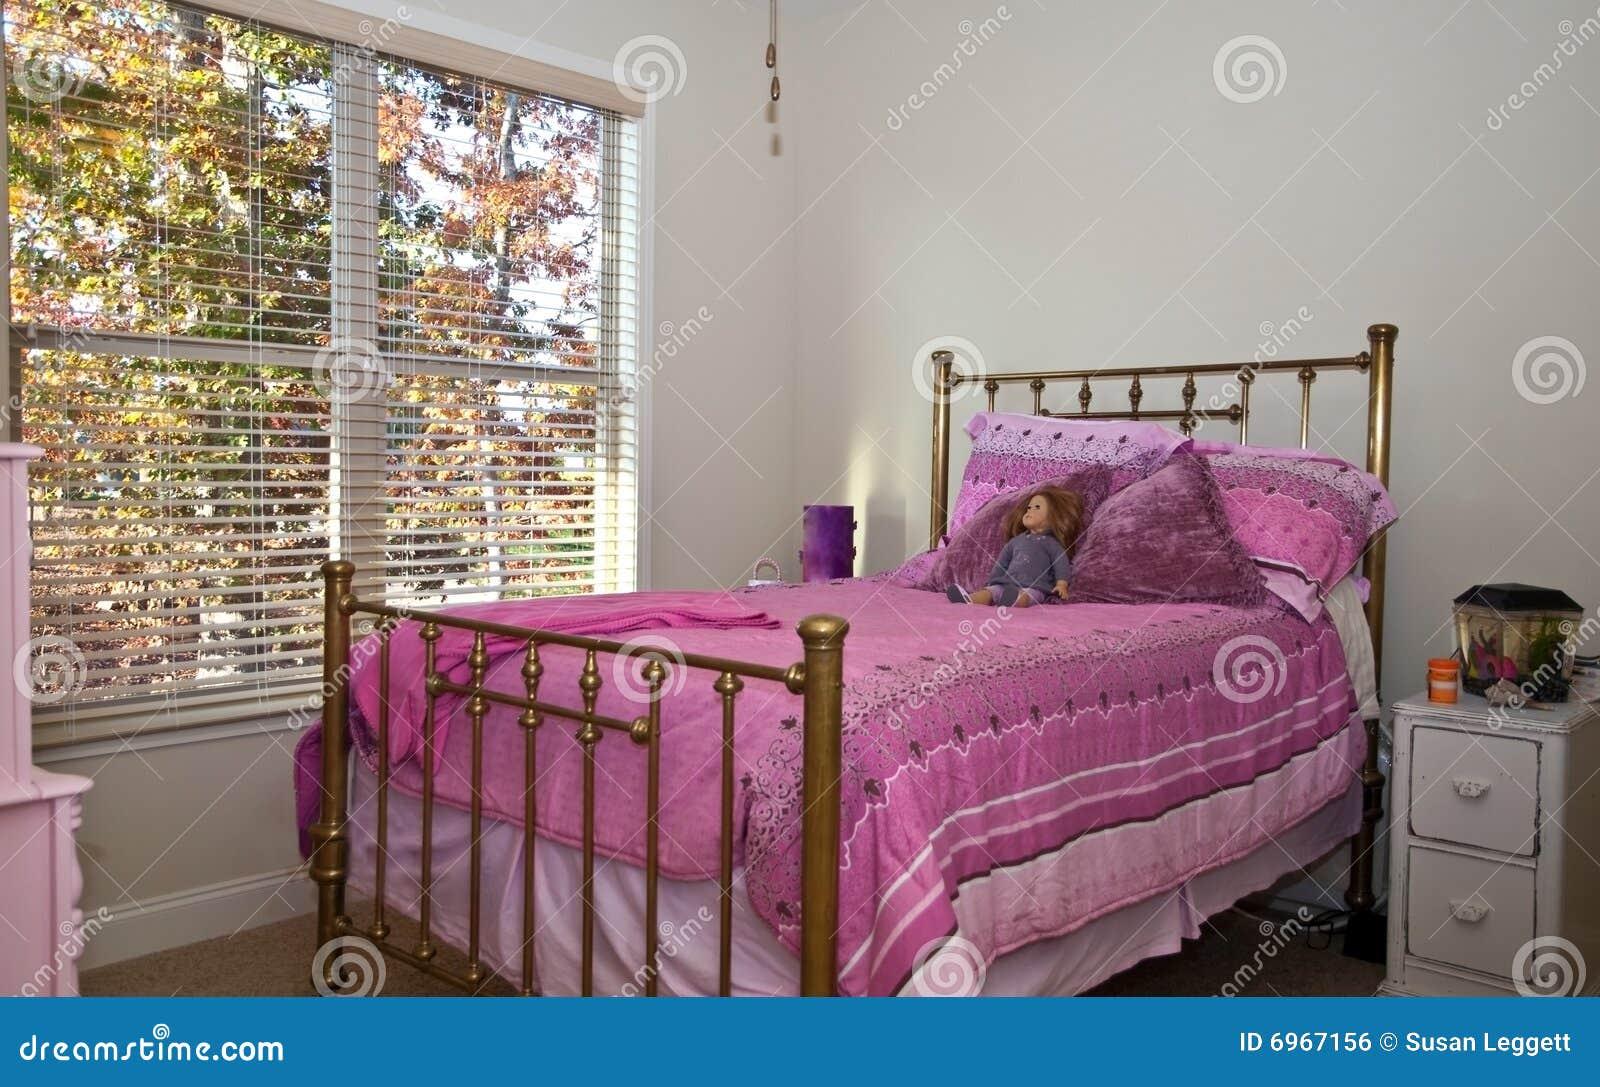 Slapen bedden slaapbanken goedkope slaapbank meisjes slaapkamer